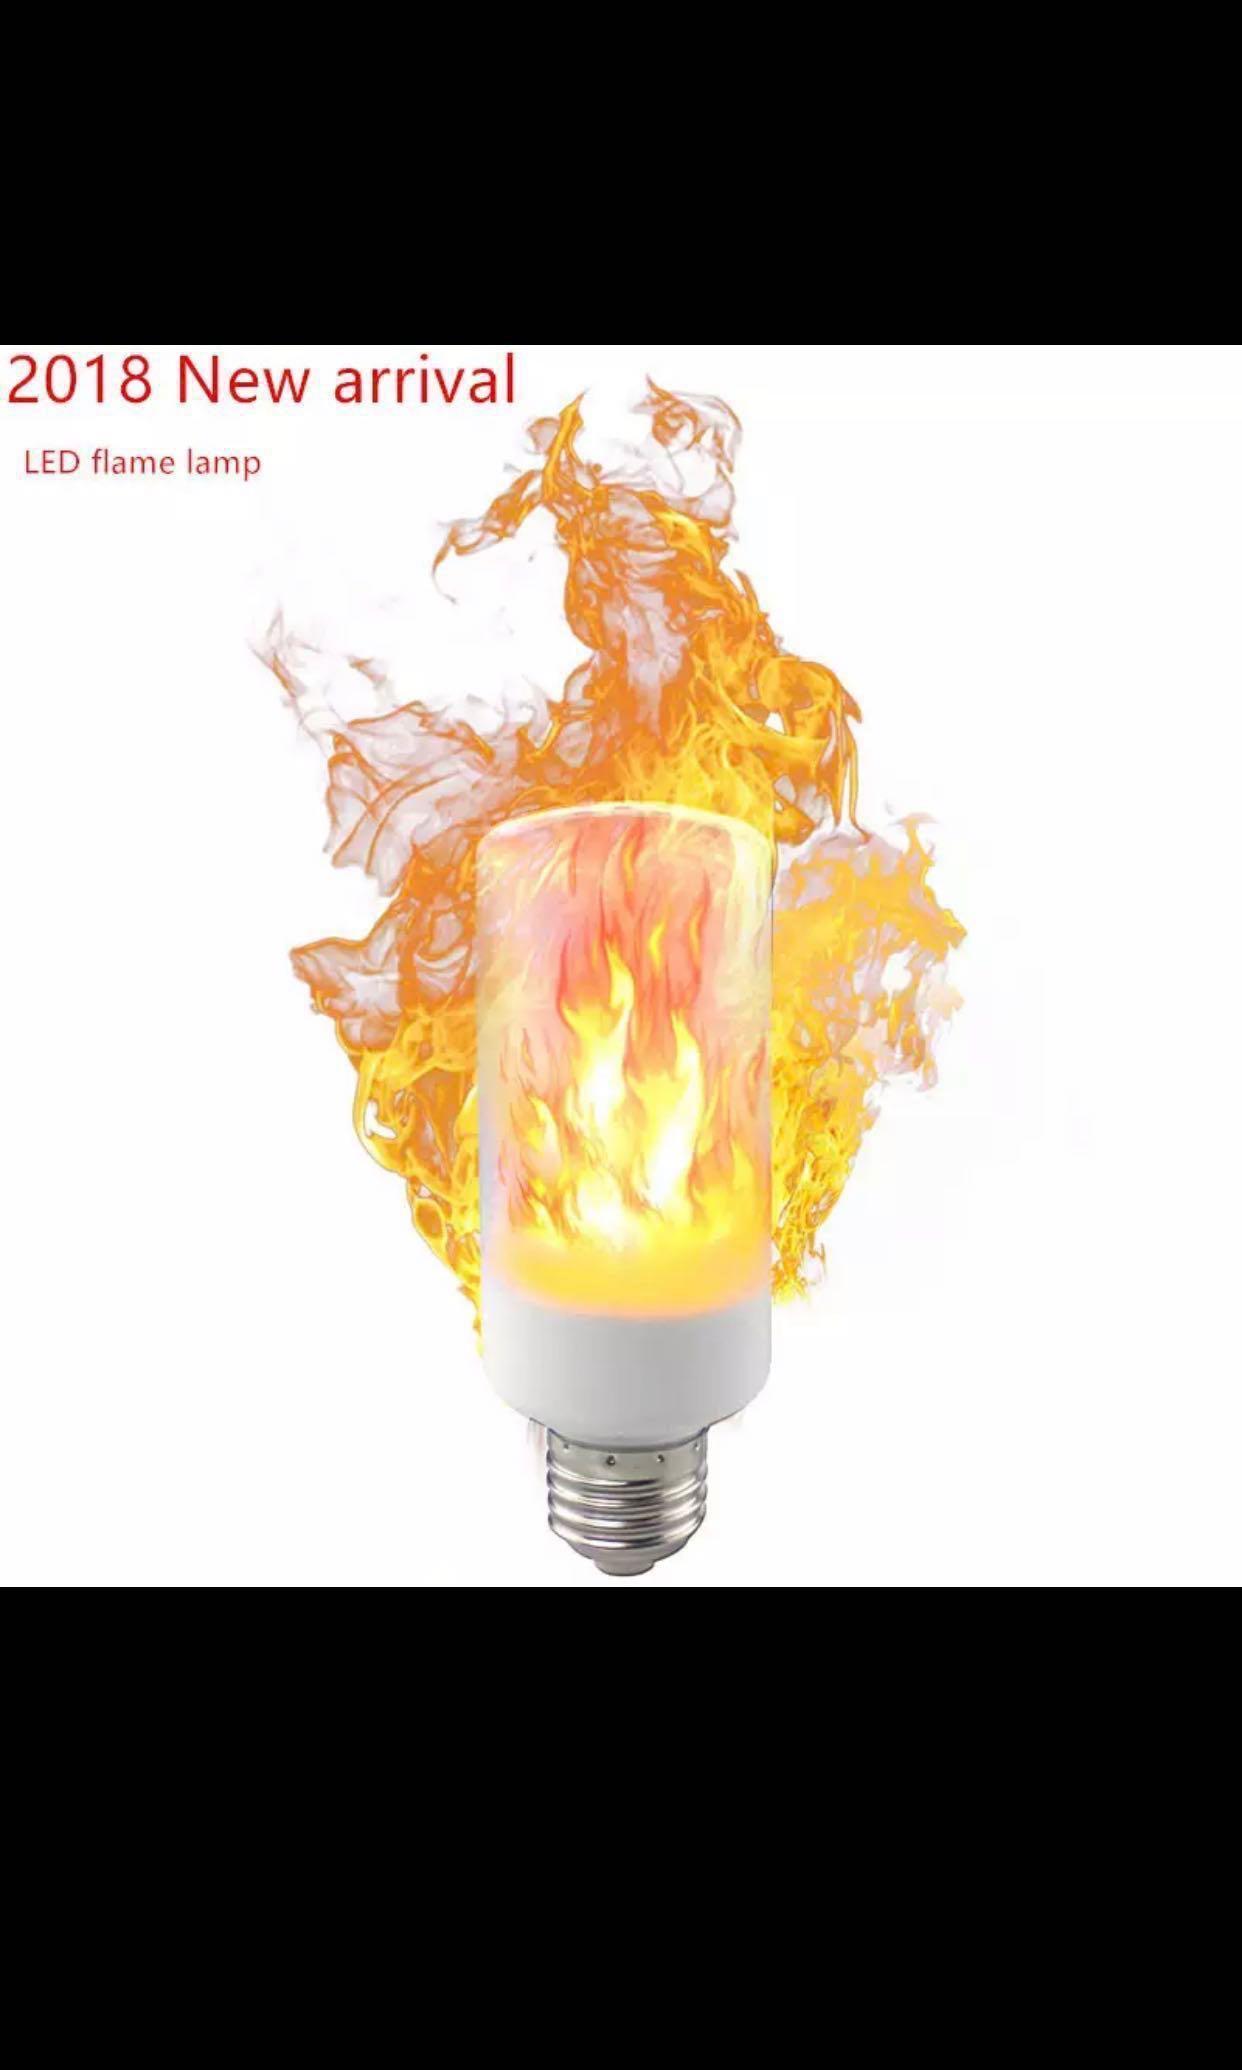 LED FLAME LAMP BULB